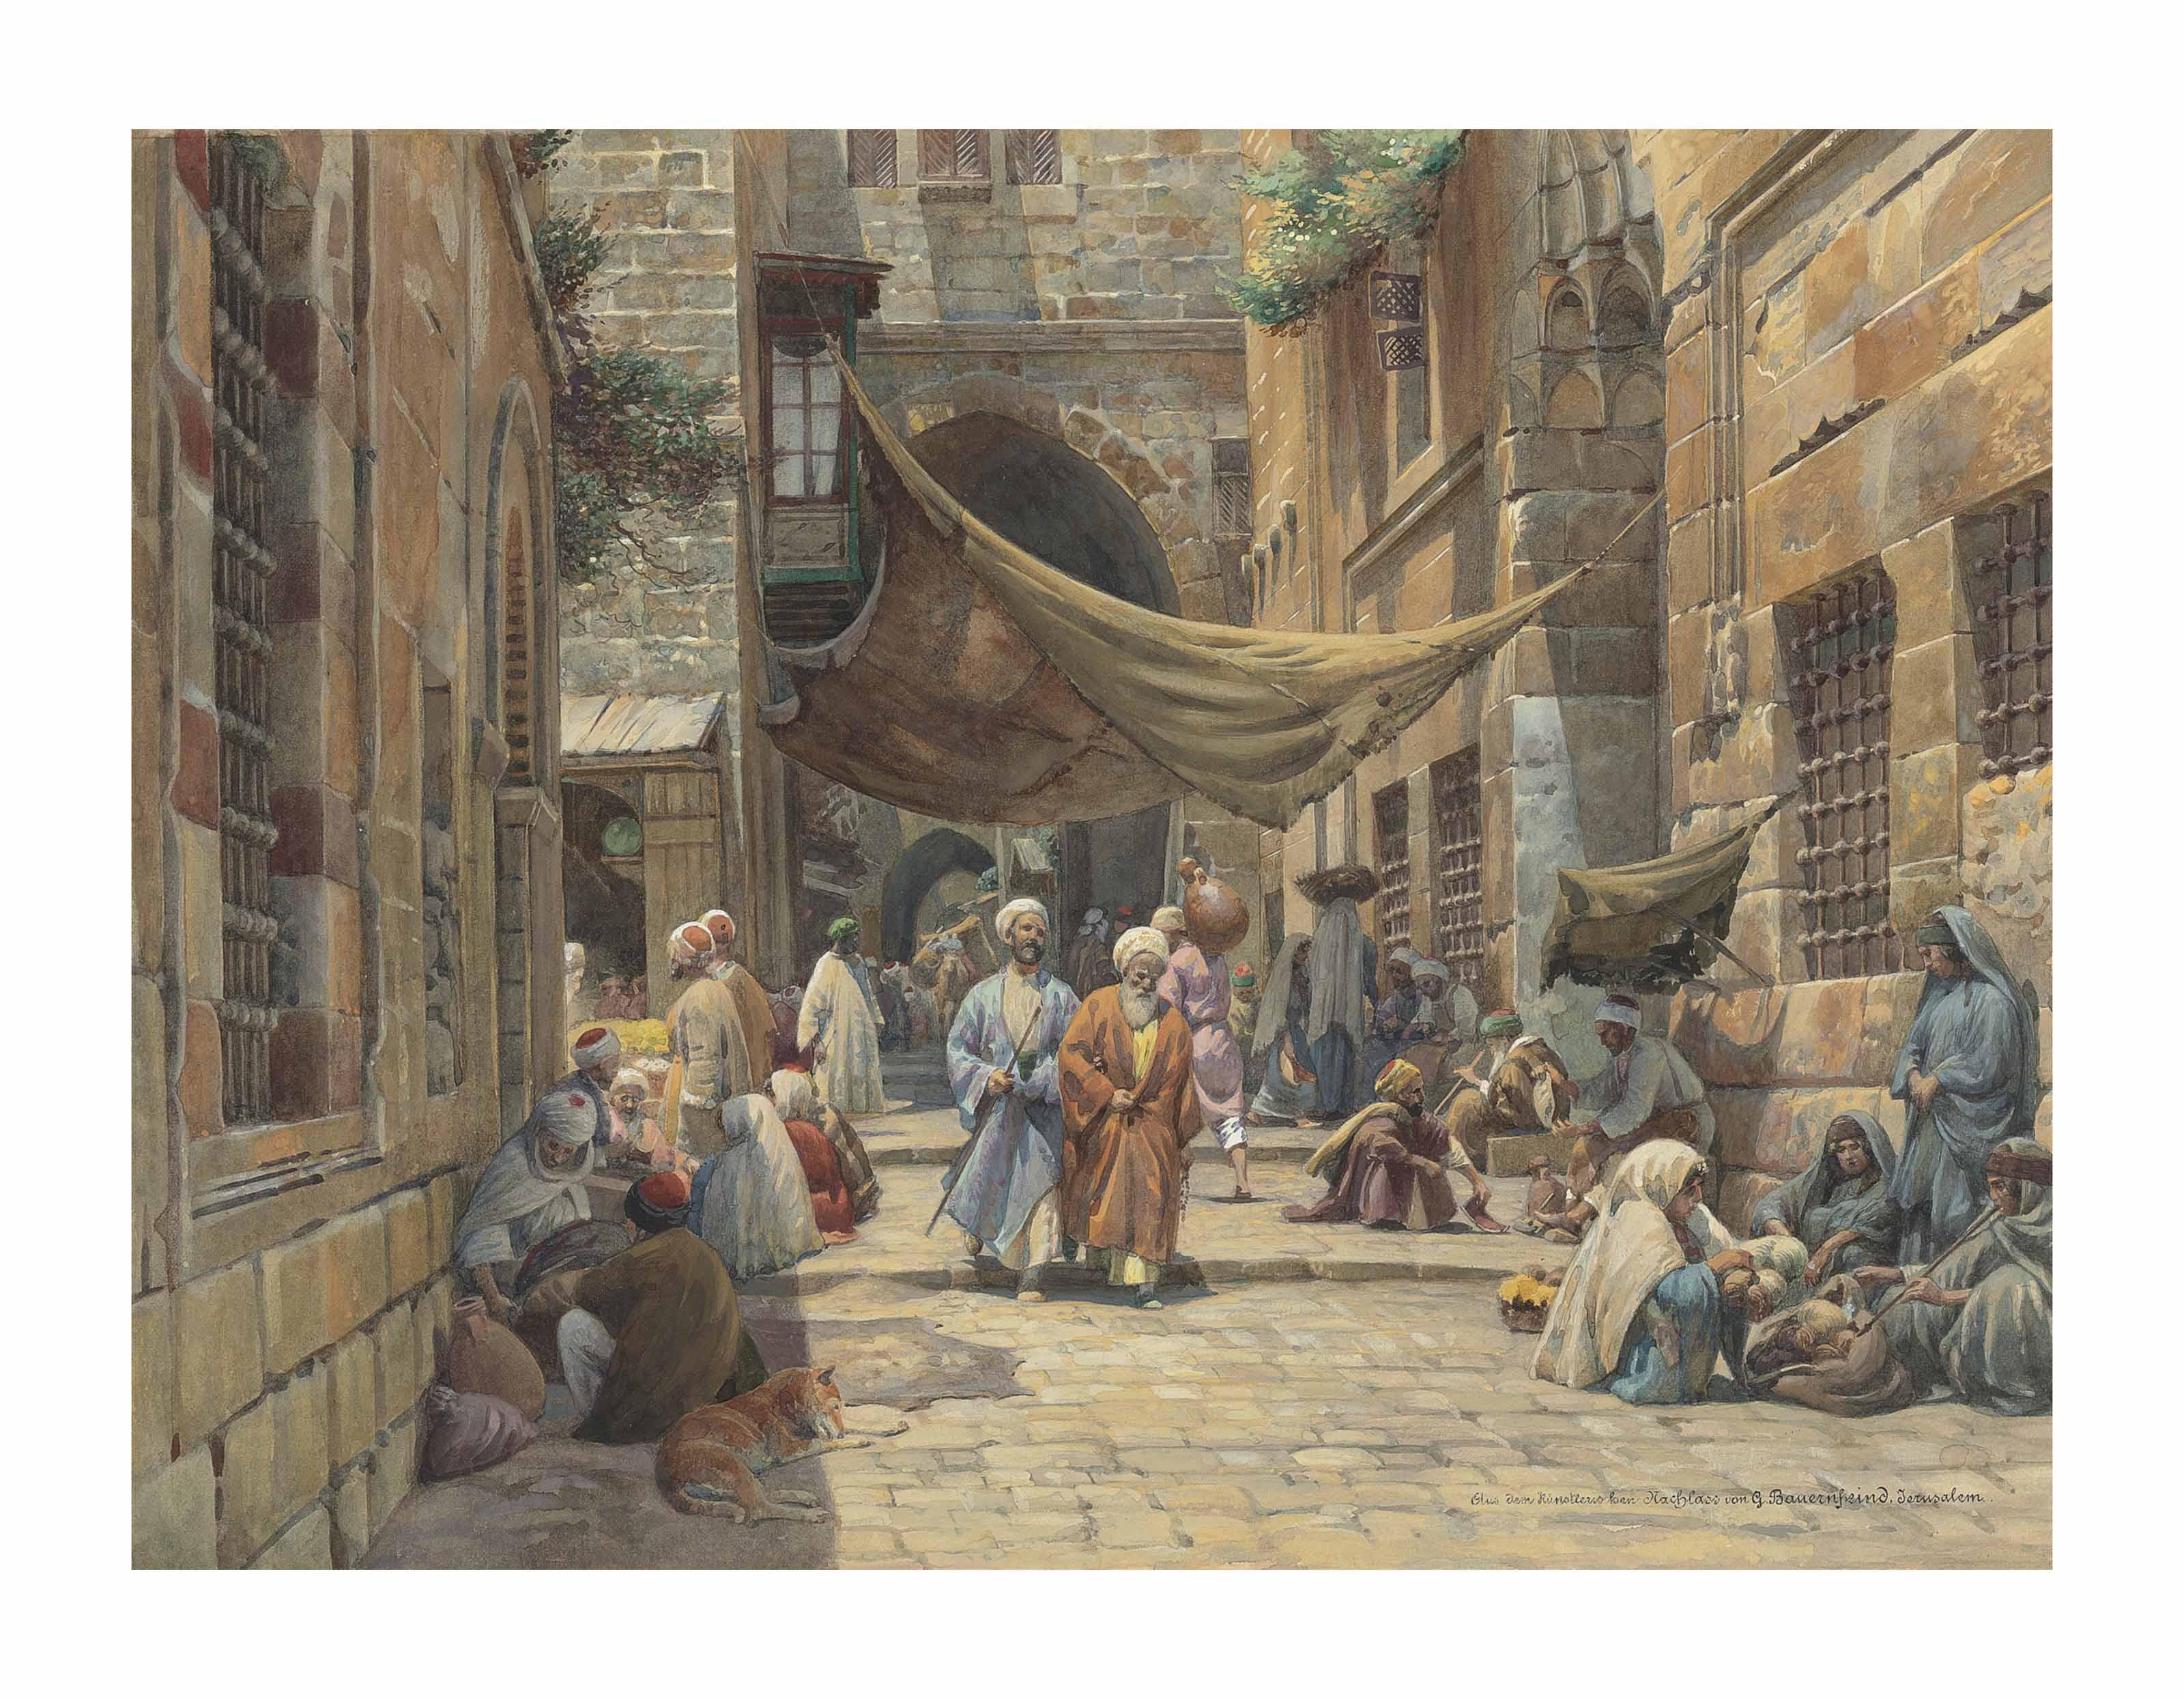 King David Street, Jerusalem